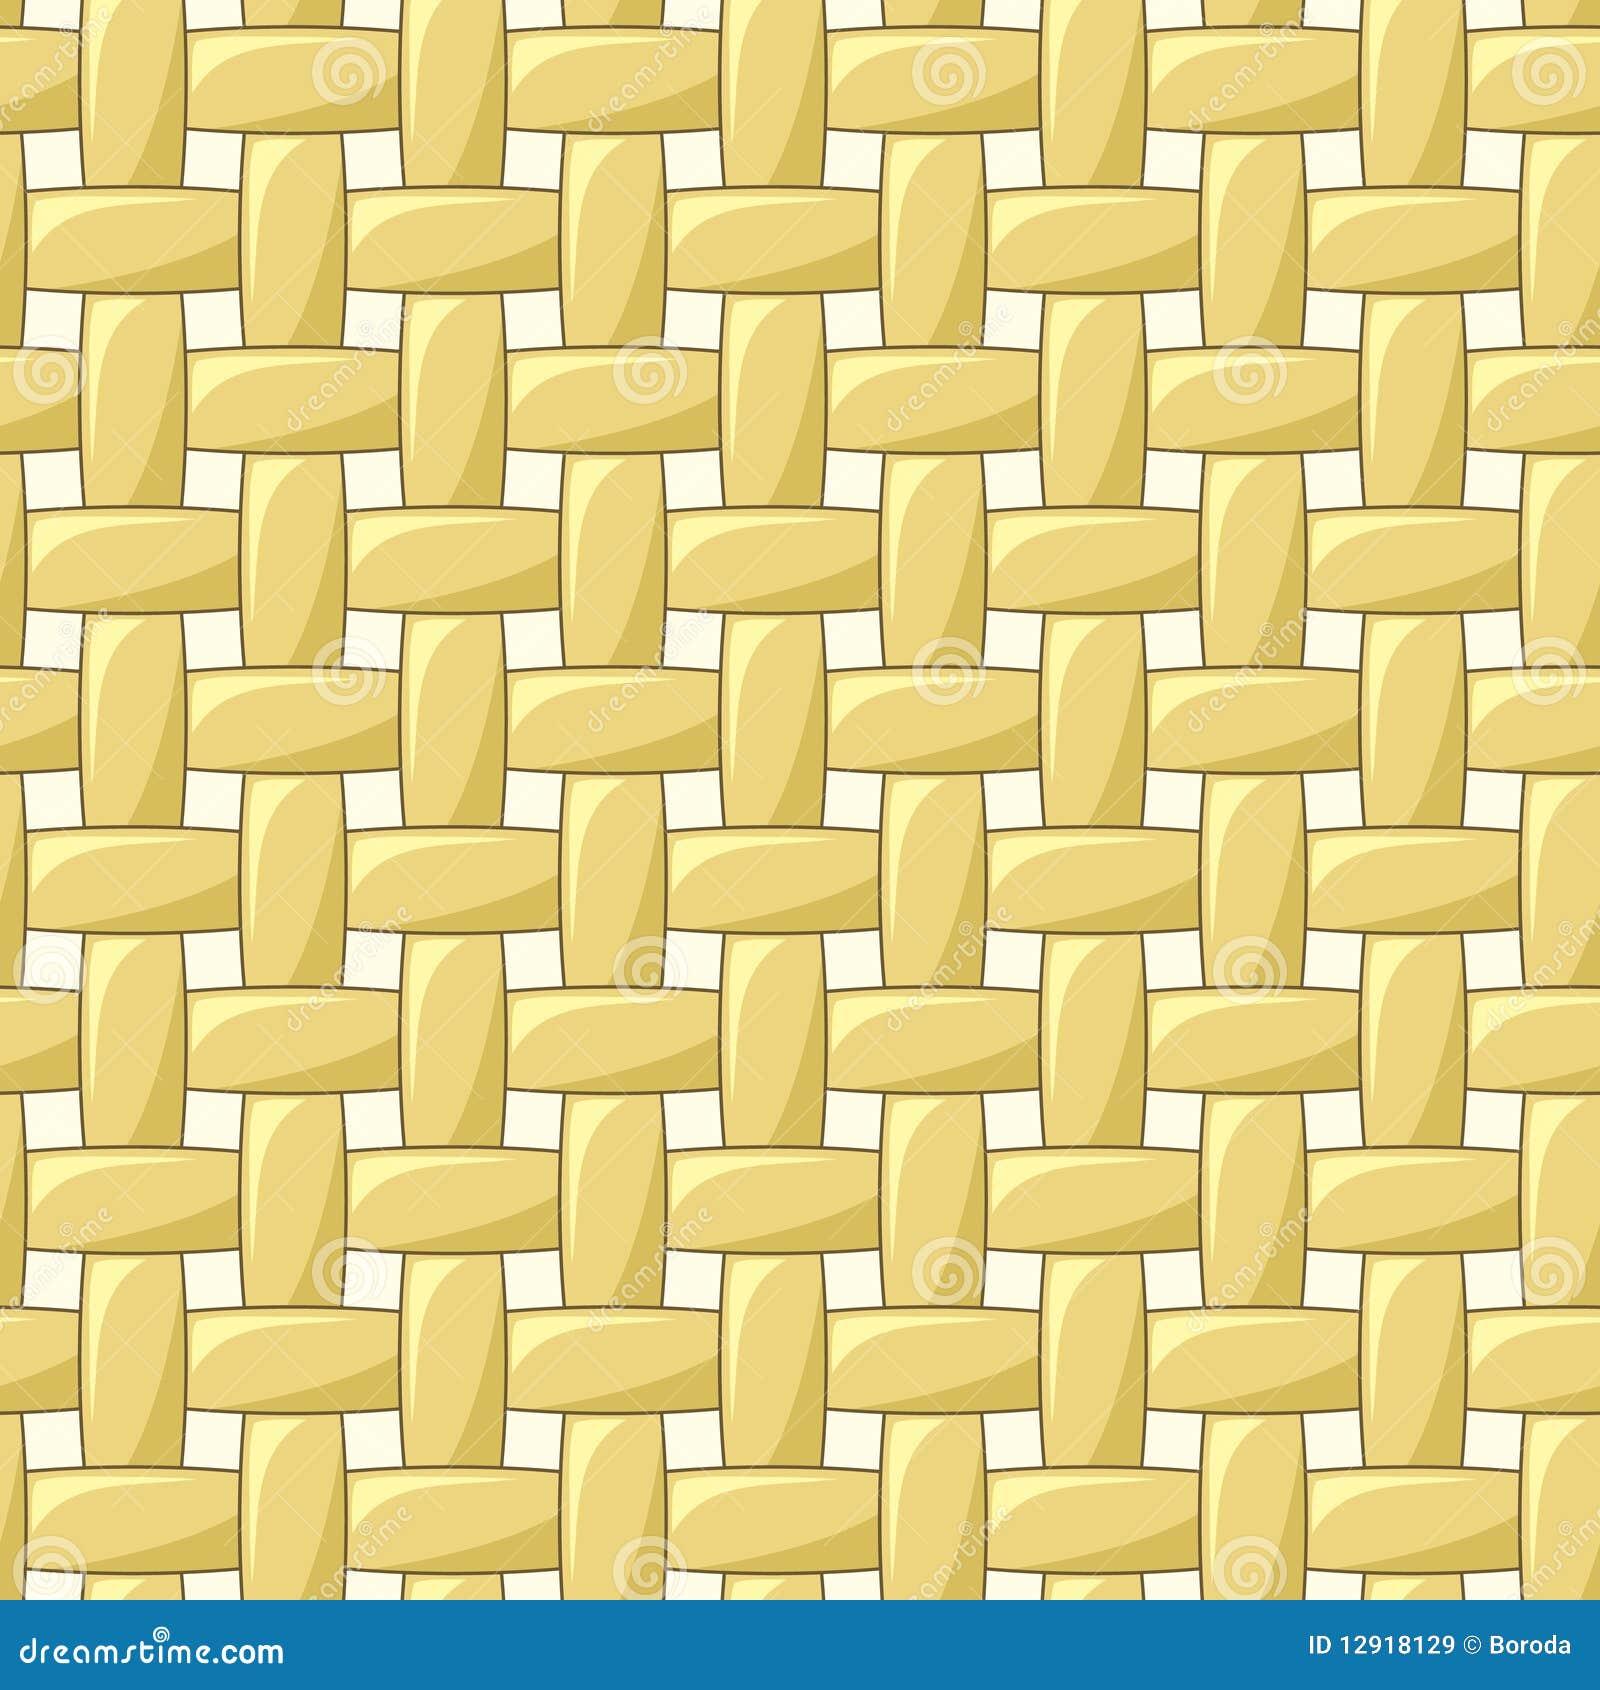 Card Weaving Patterns